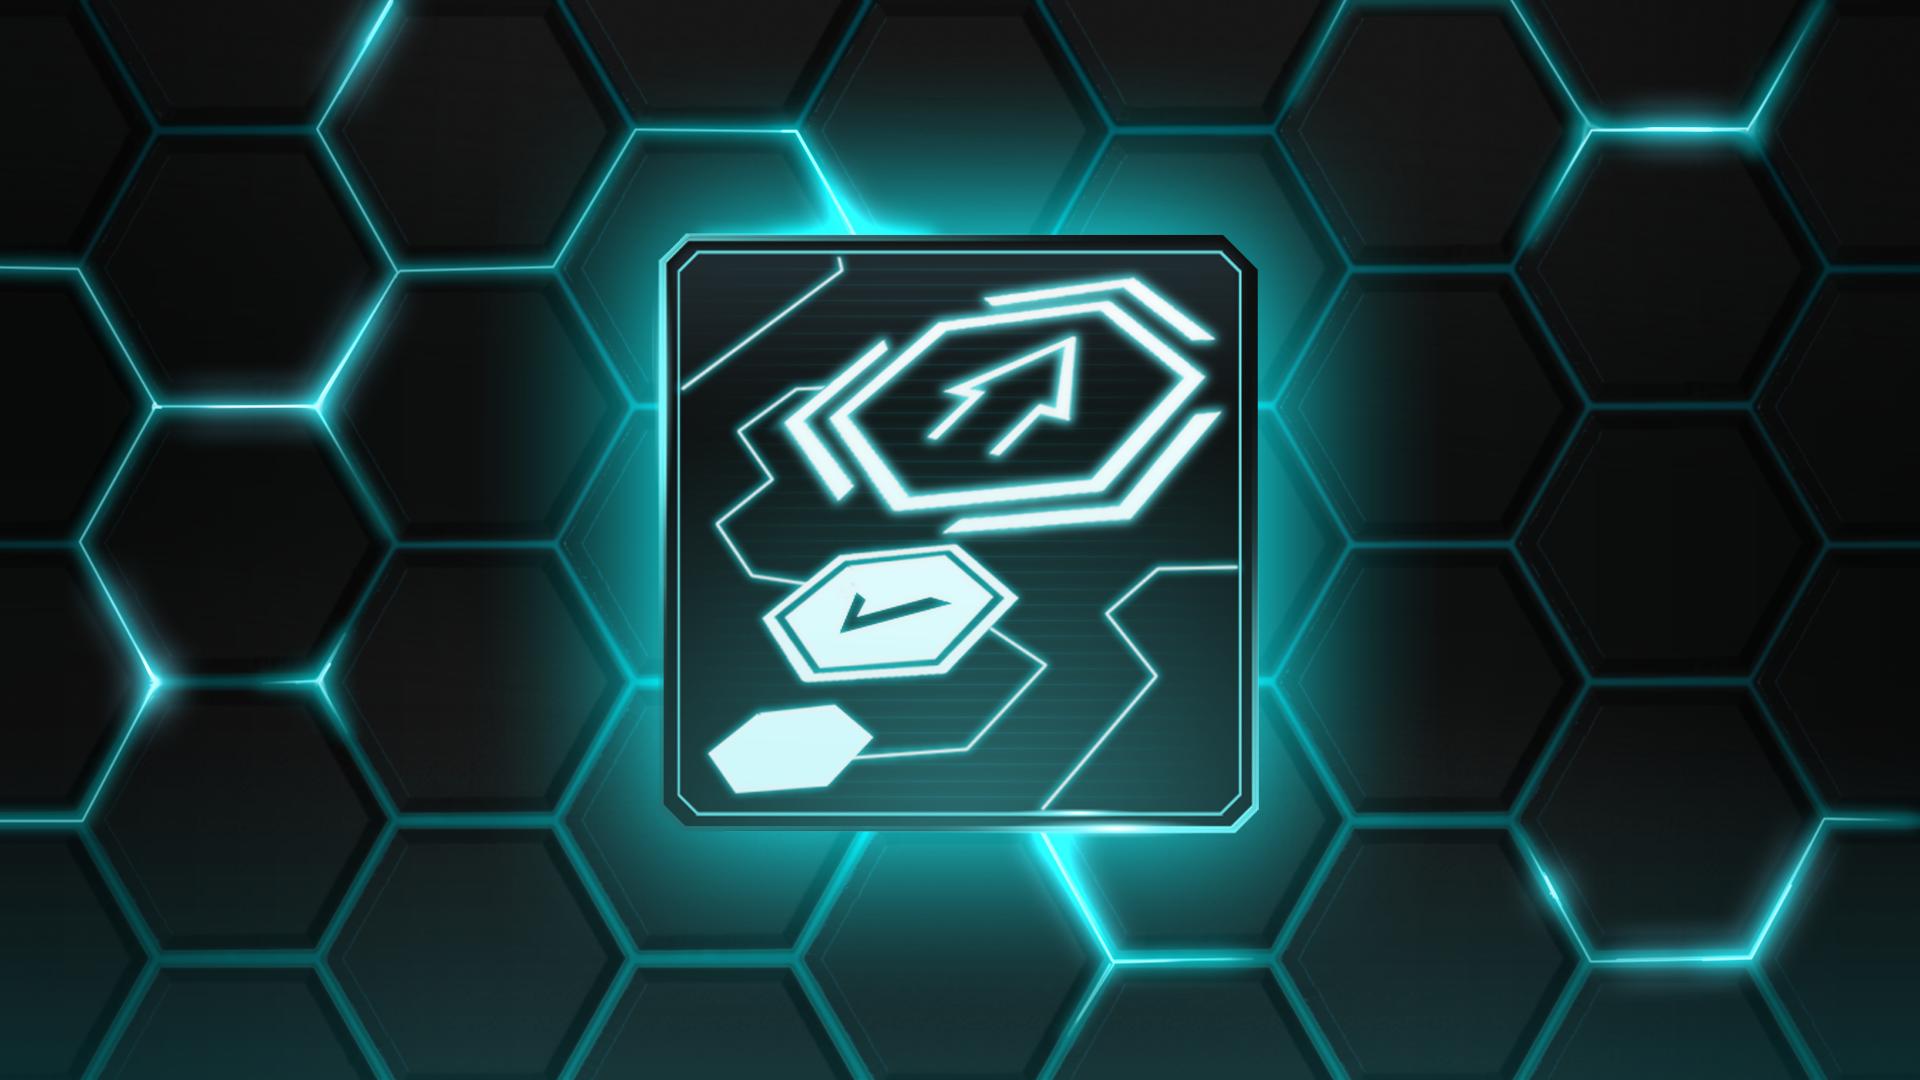 Icon for Grade A Upgrade